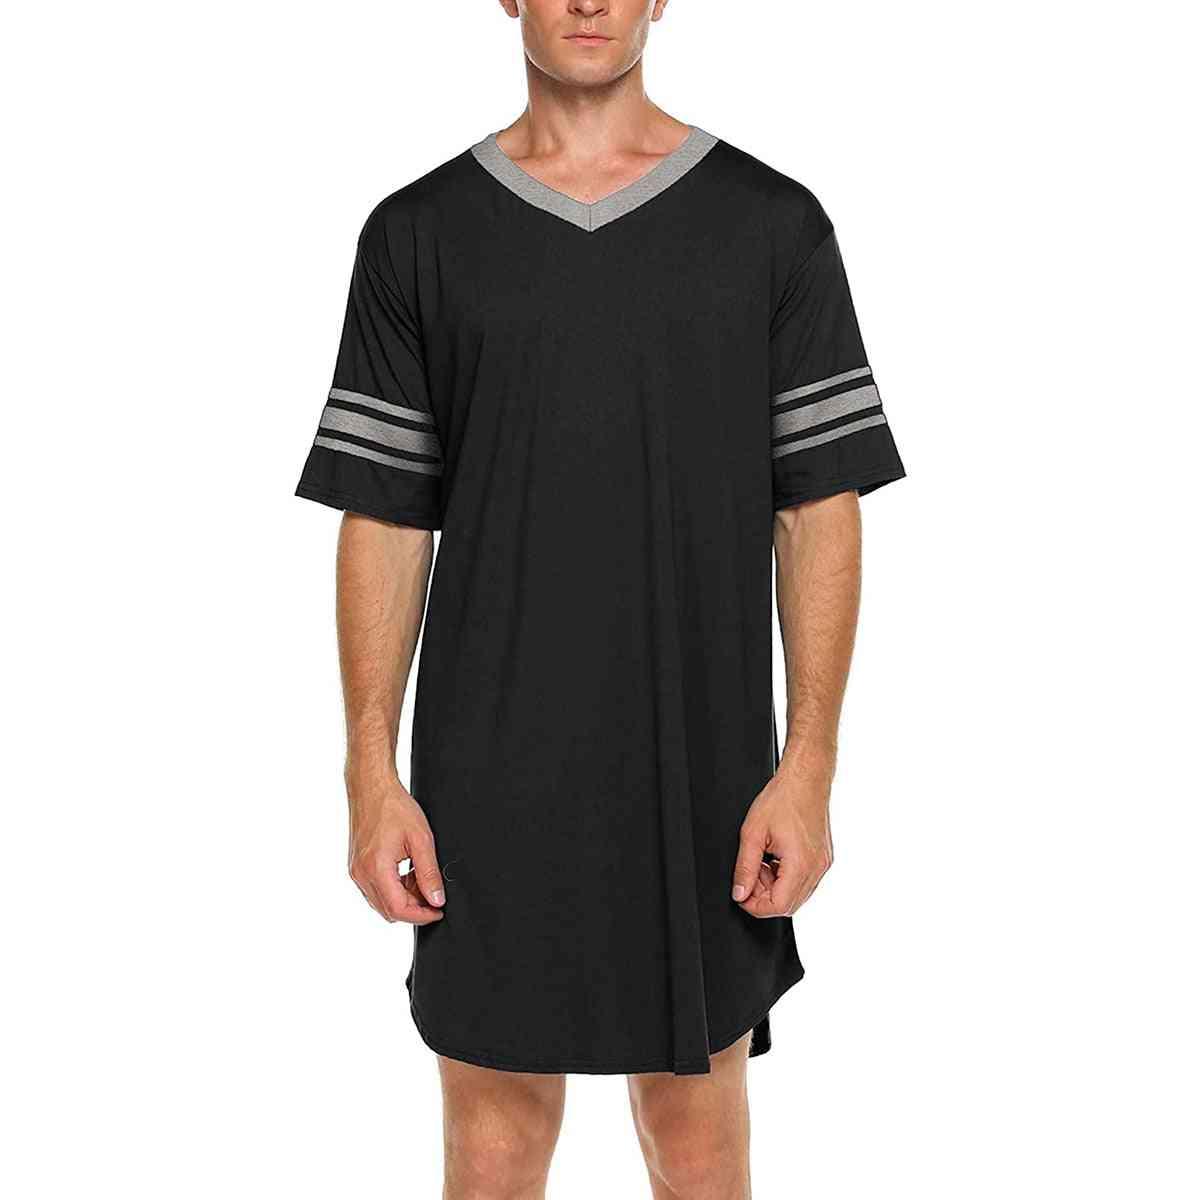 Men Casual Short Sleeve, Long Nightshirt Sleepwear